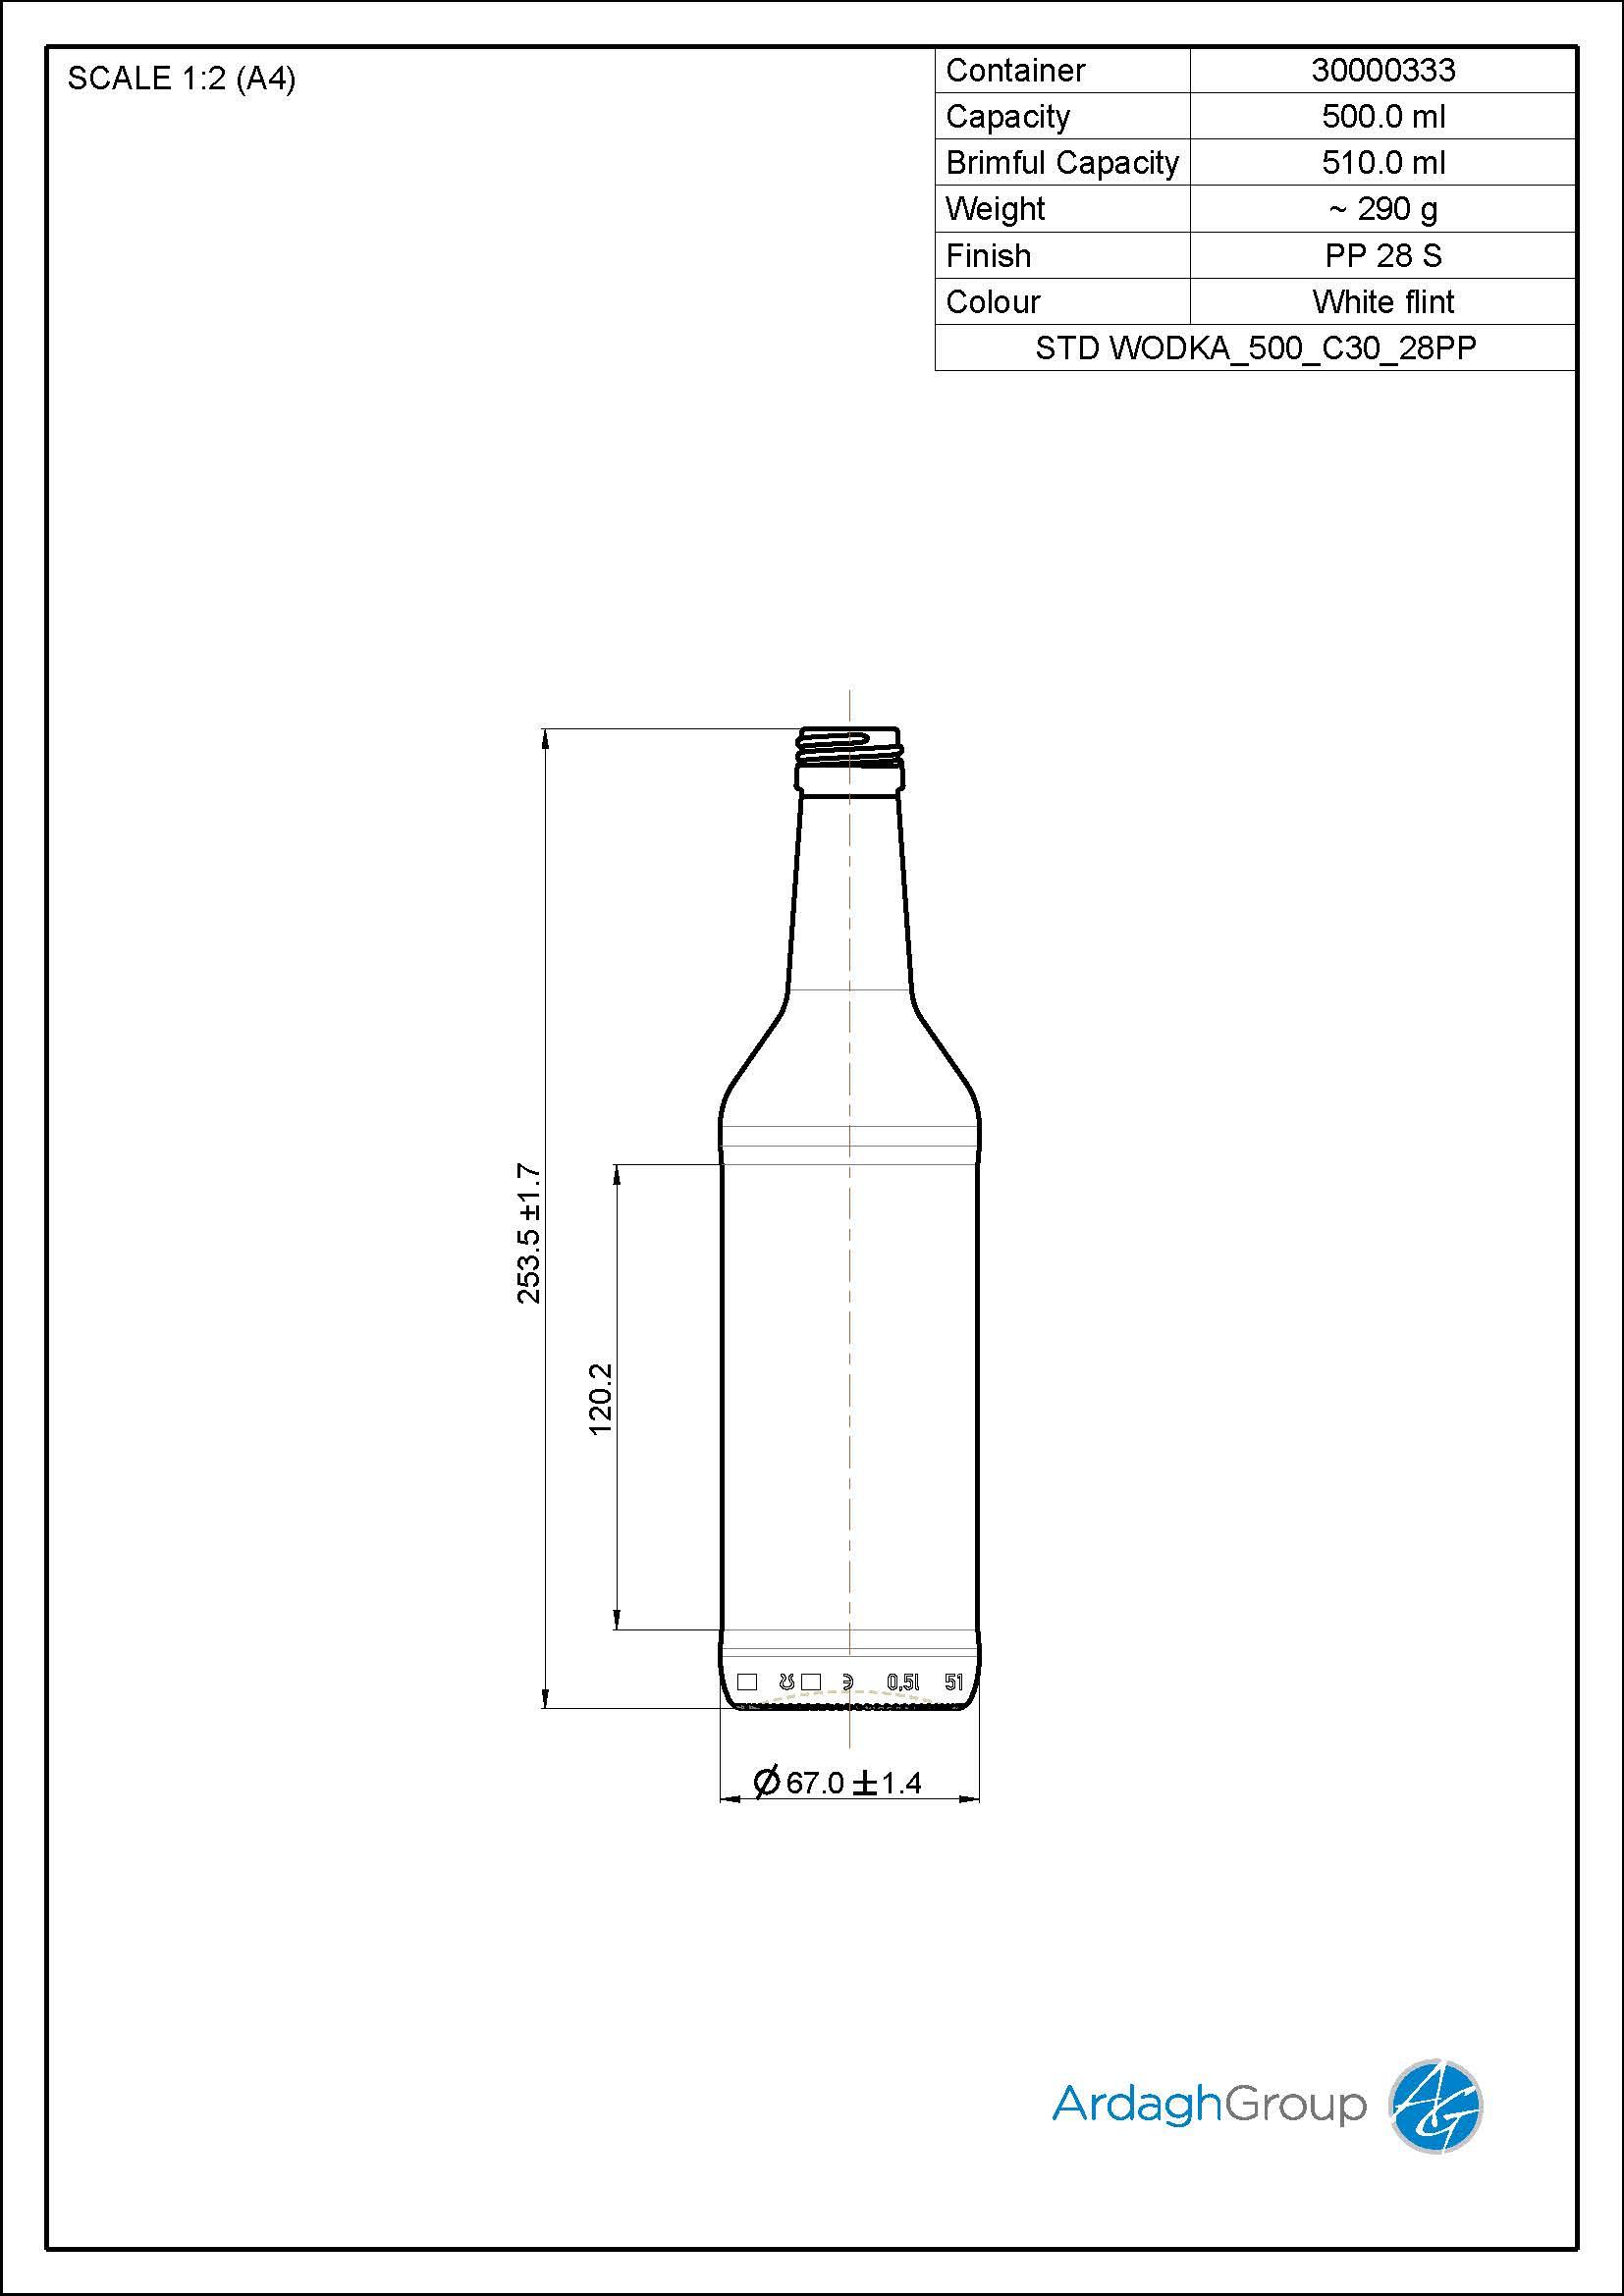 Std. Wodka_500_C30_18PP